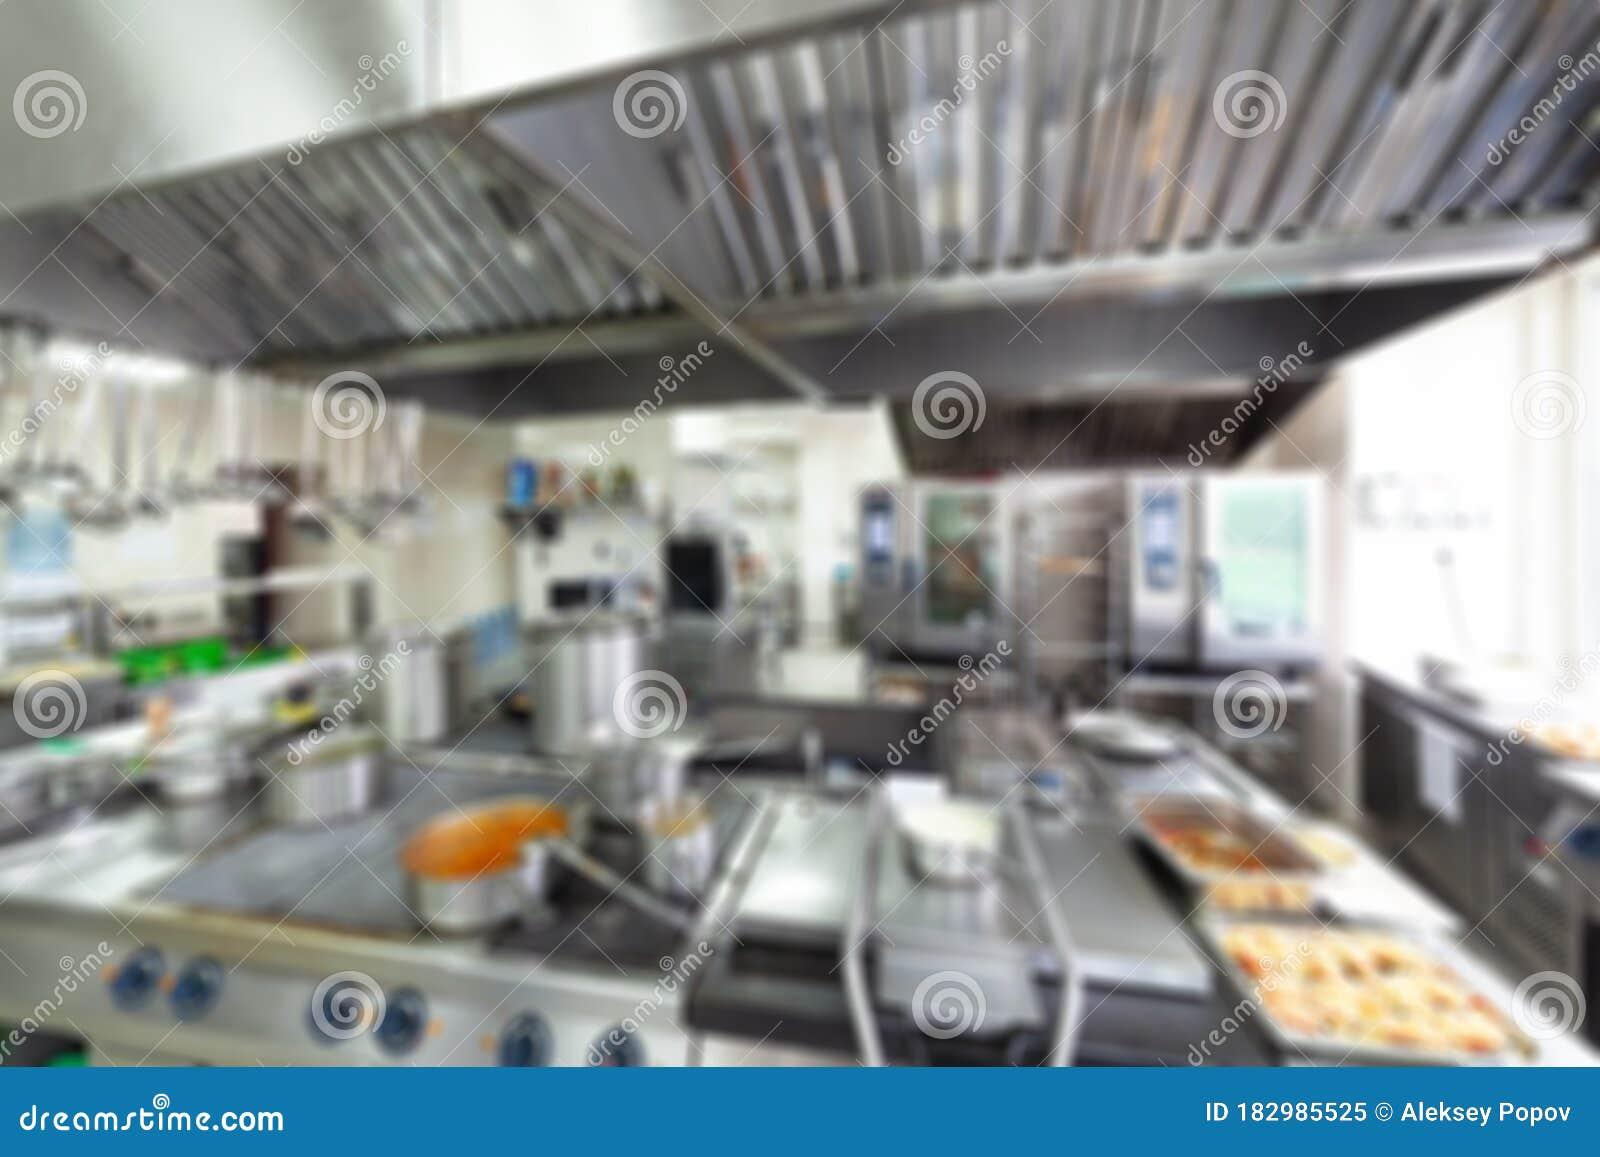 Cuisine Of Restaurant Chrome Kitchen Equipment Cafe Stock Image Image Of Prepare Background 182985525